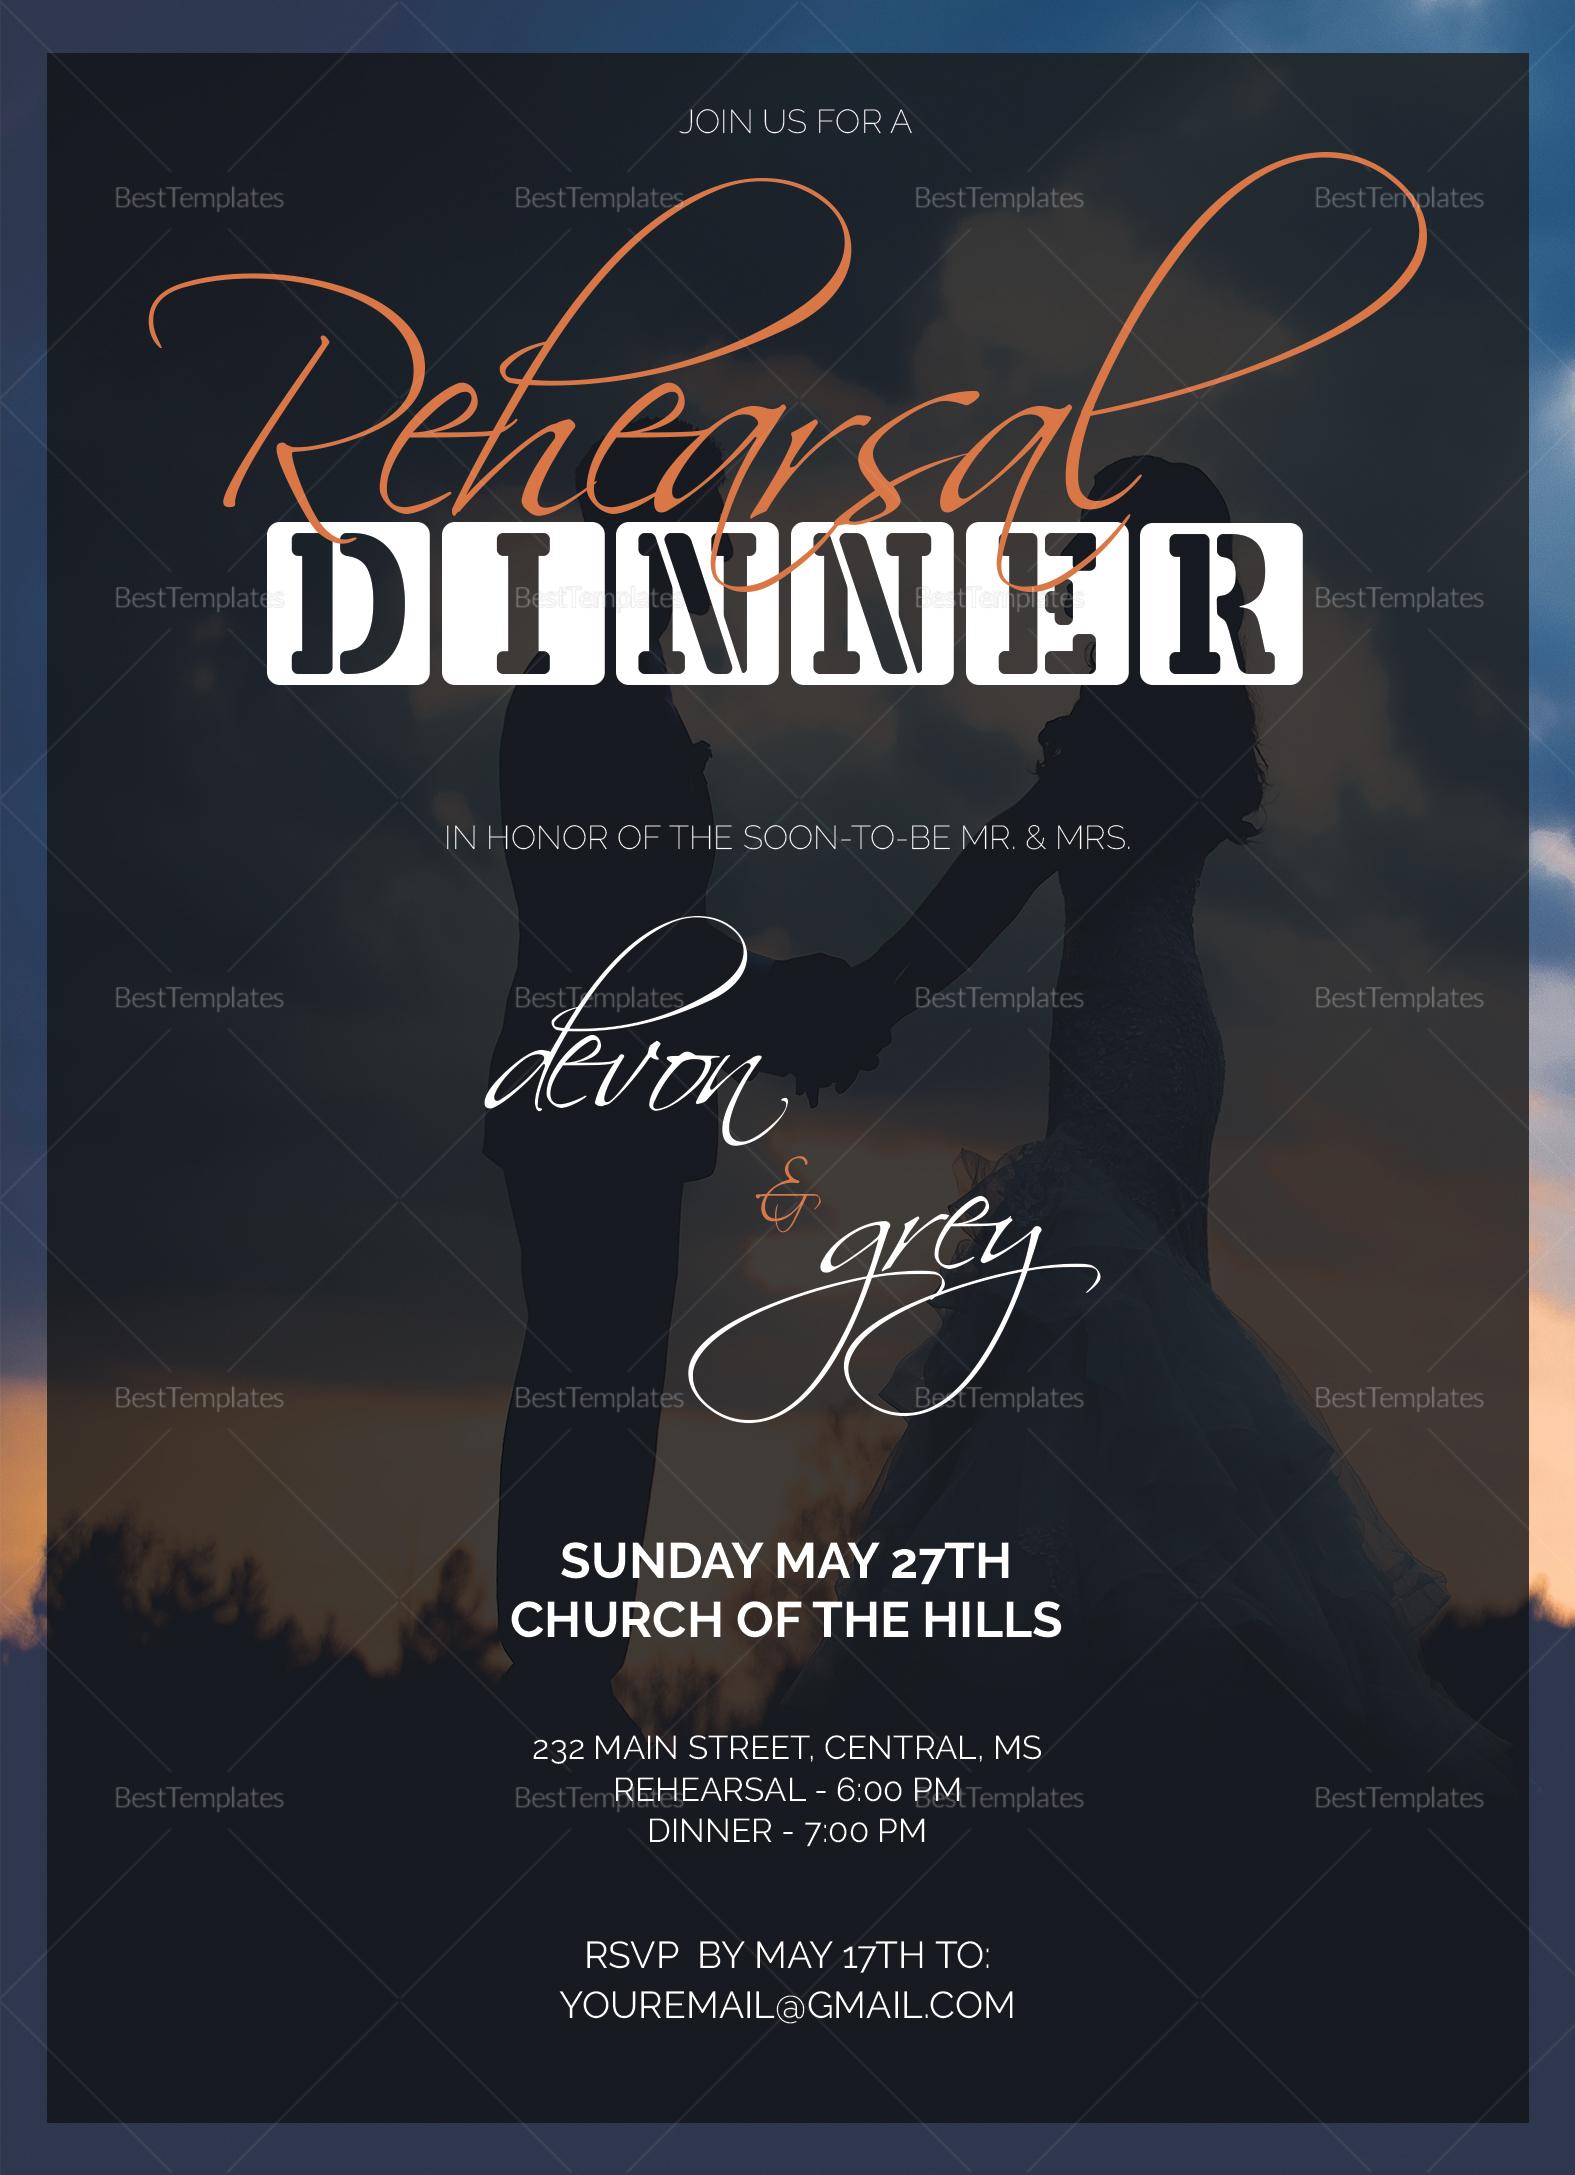 Wedding Dinner Invitation Card Design Template in Word